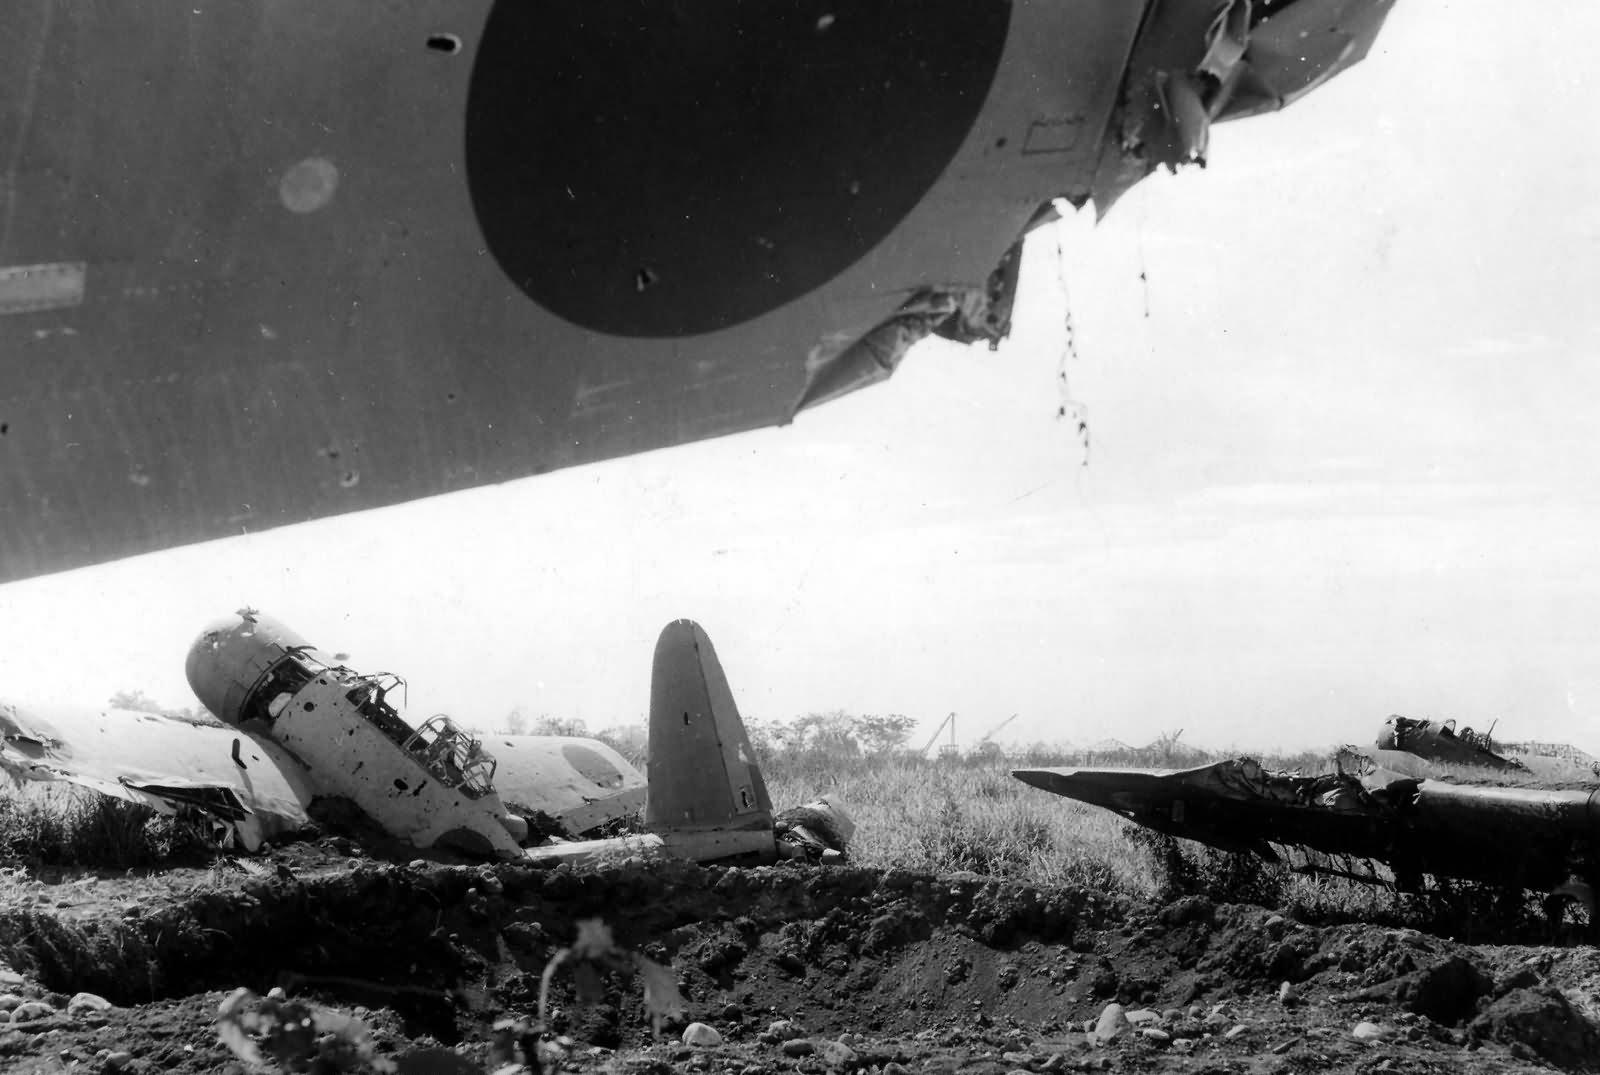 Japanese Aircraft Wrecks at Lae New Guinea 1943